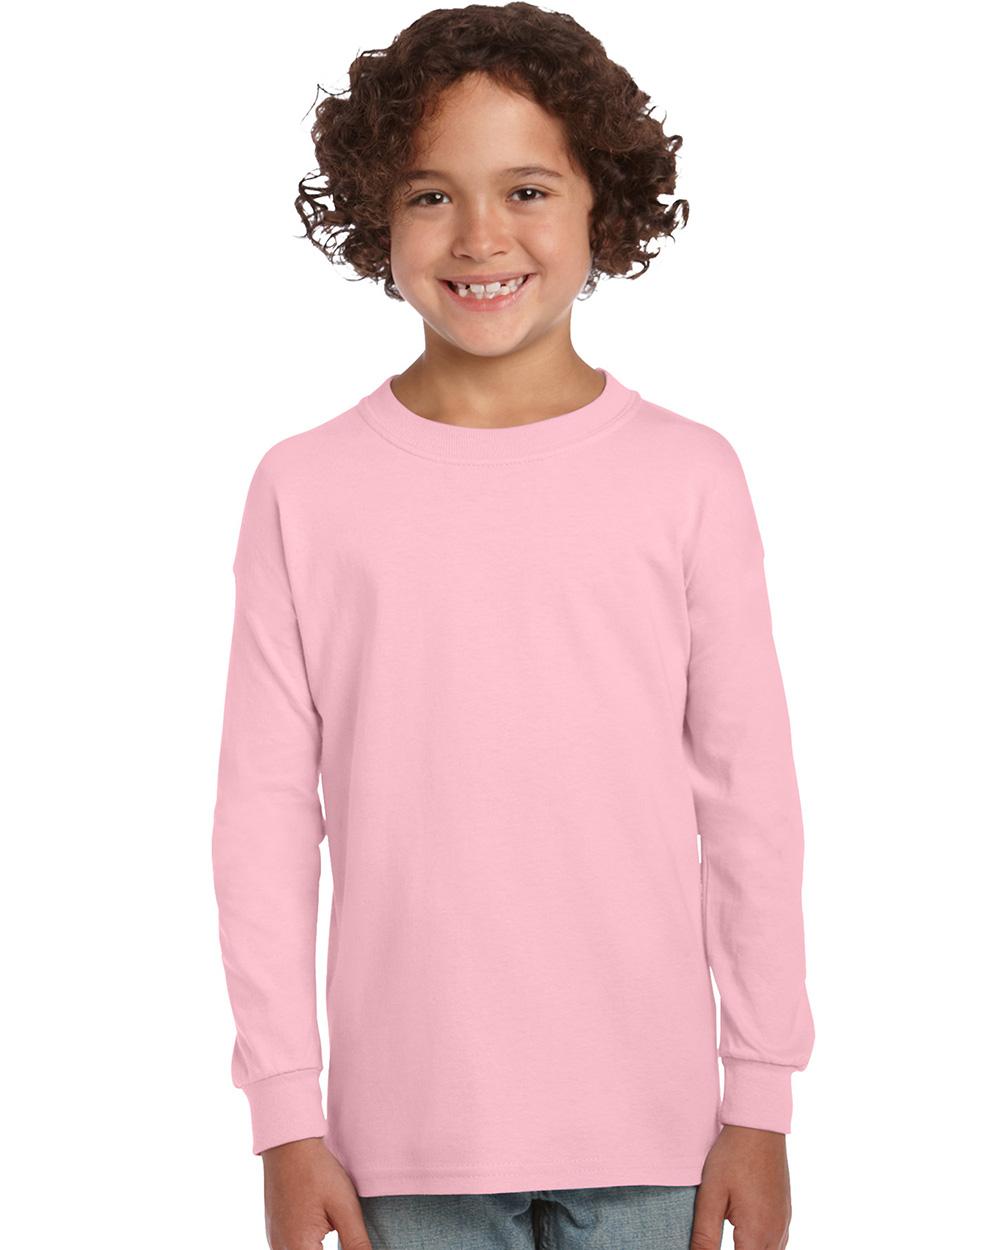 Gildan 2400B     Ultra Cotton™    Classic Fit Youth Long Sleeve T-Shirt    6.0 oz. 100% Cotton